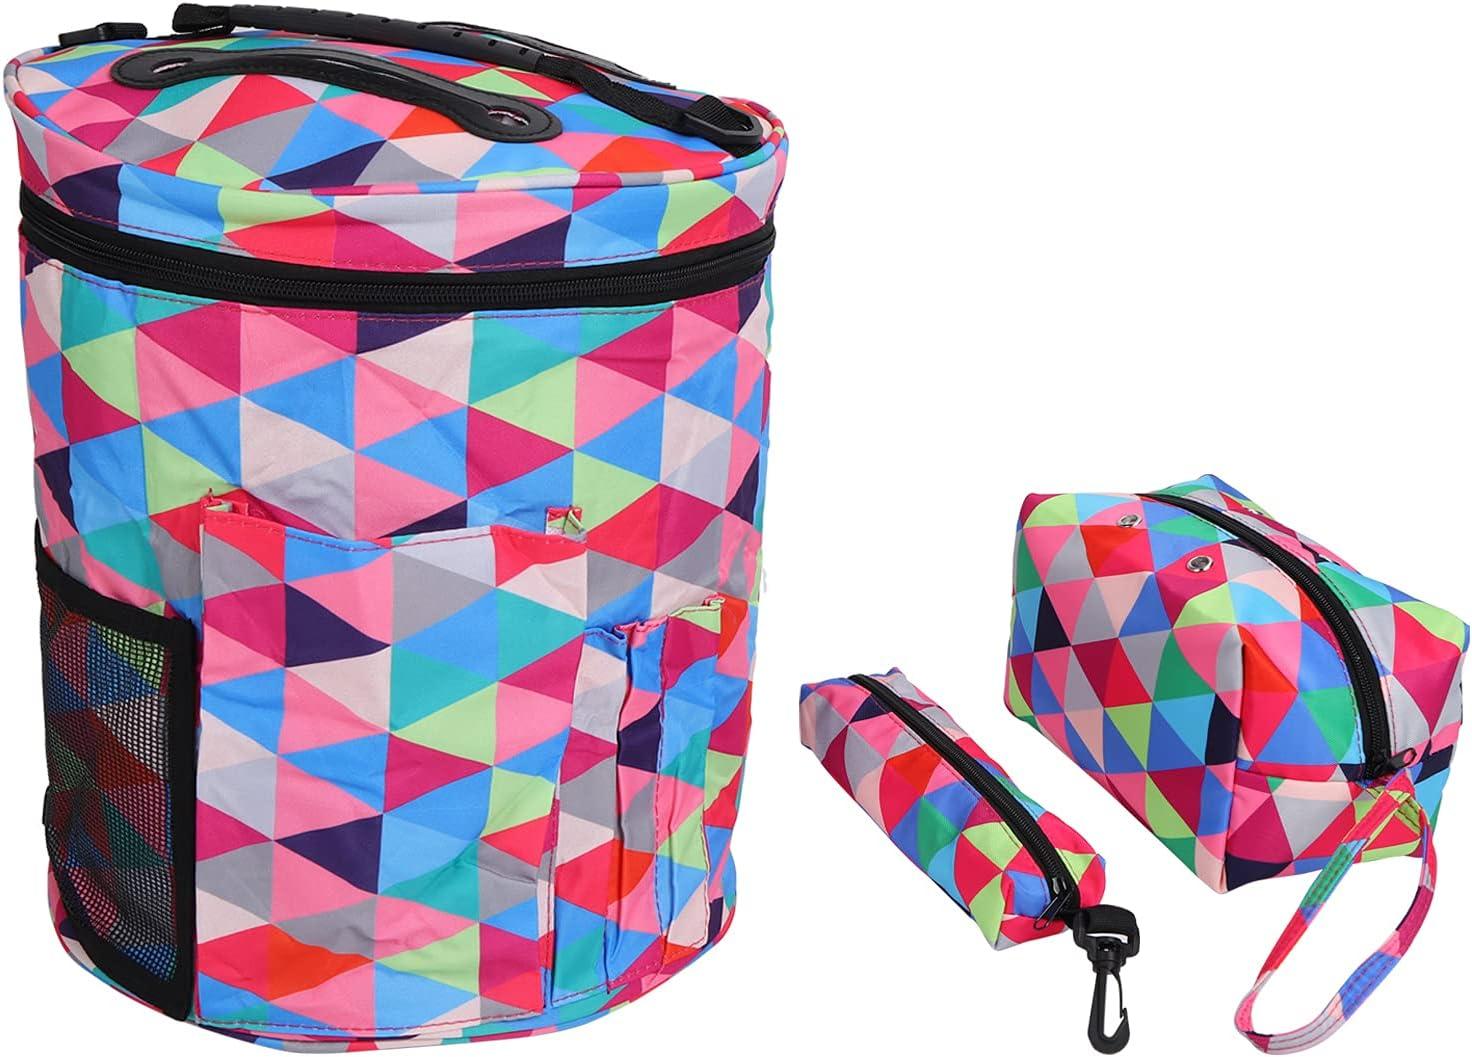 Yarn Storage 35% OFF Bag Organizer Case for supreme